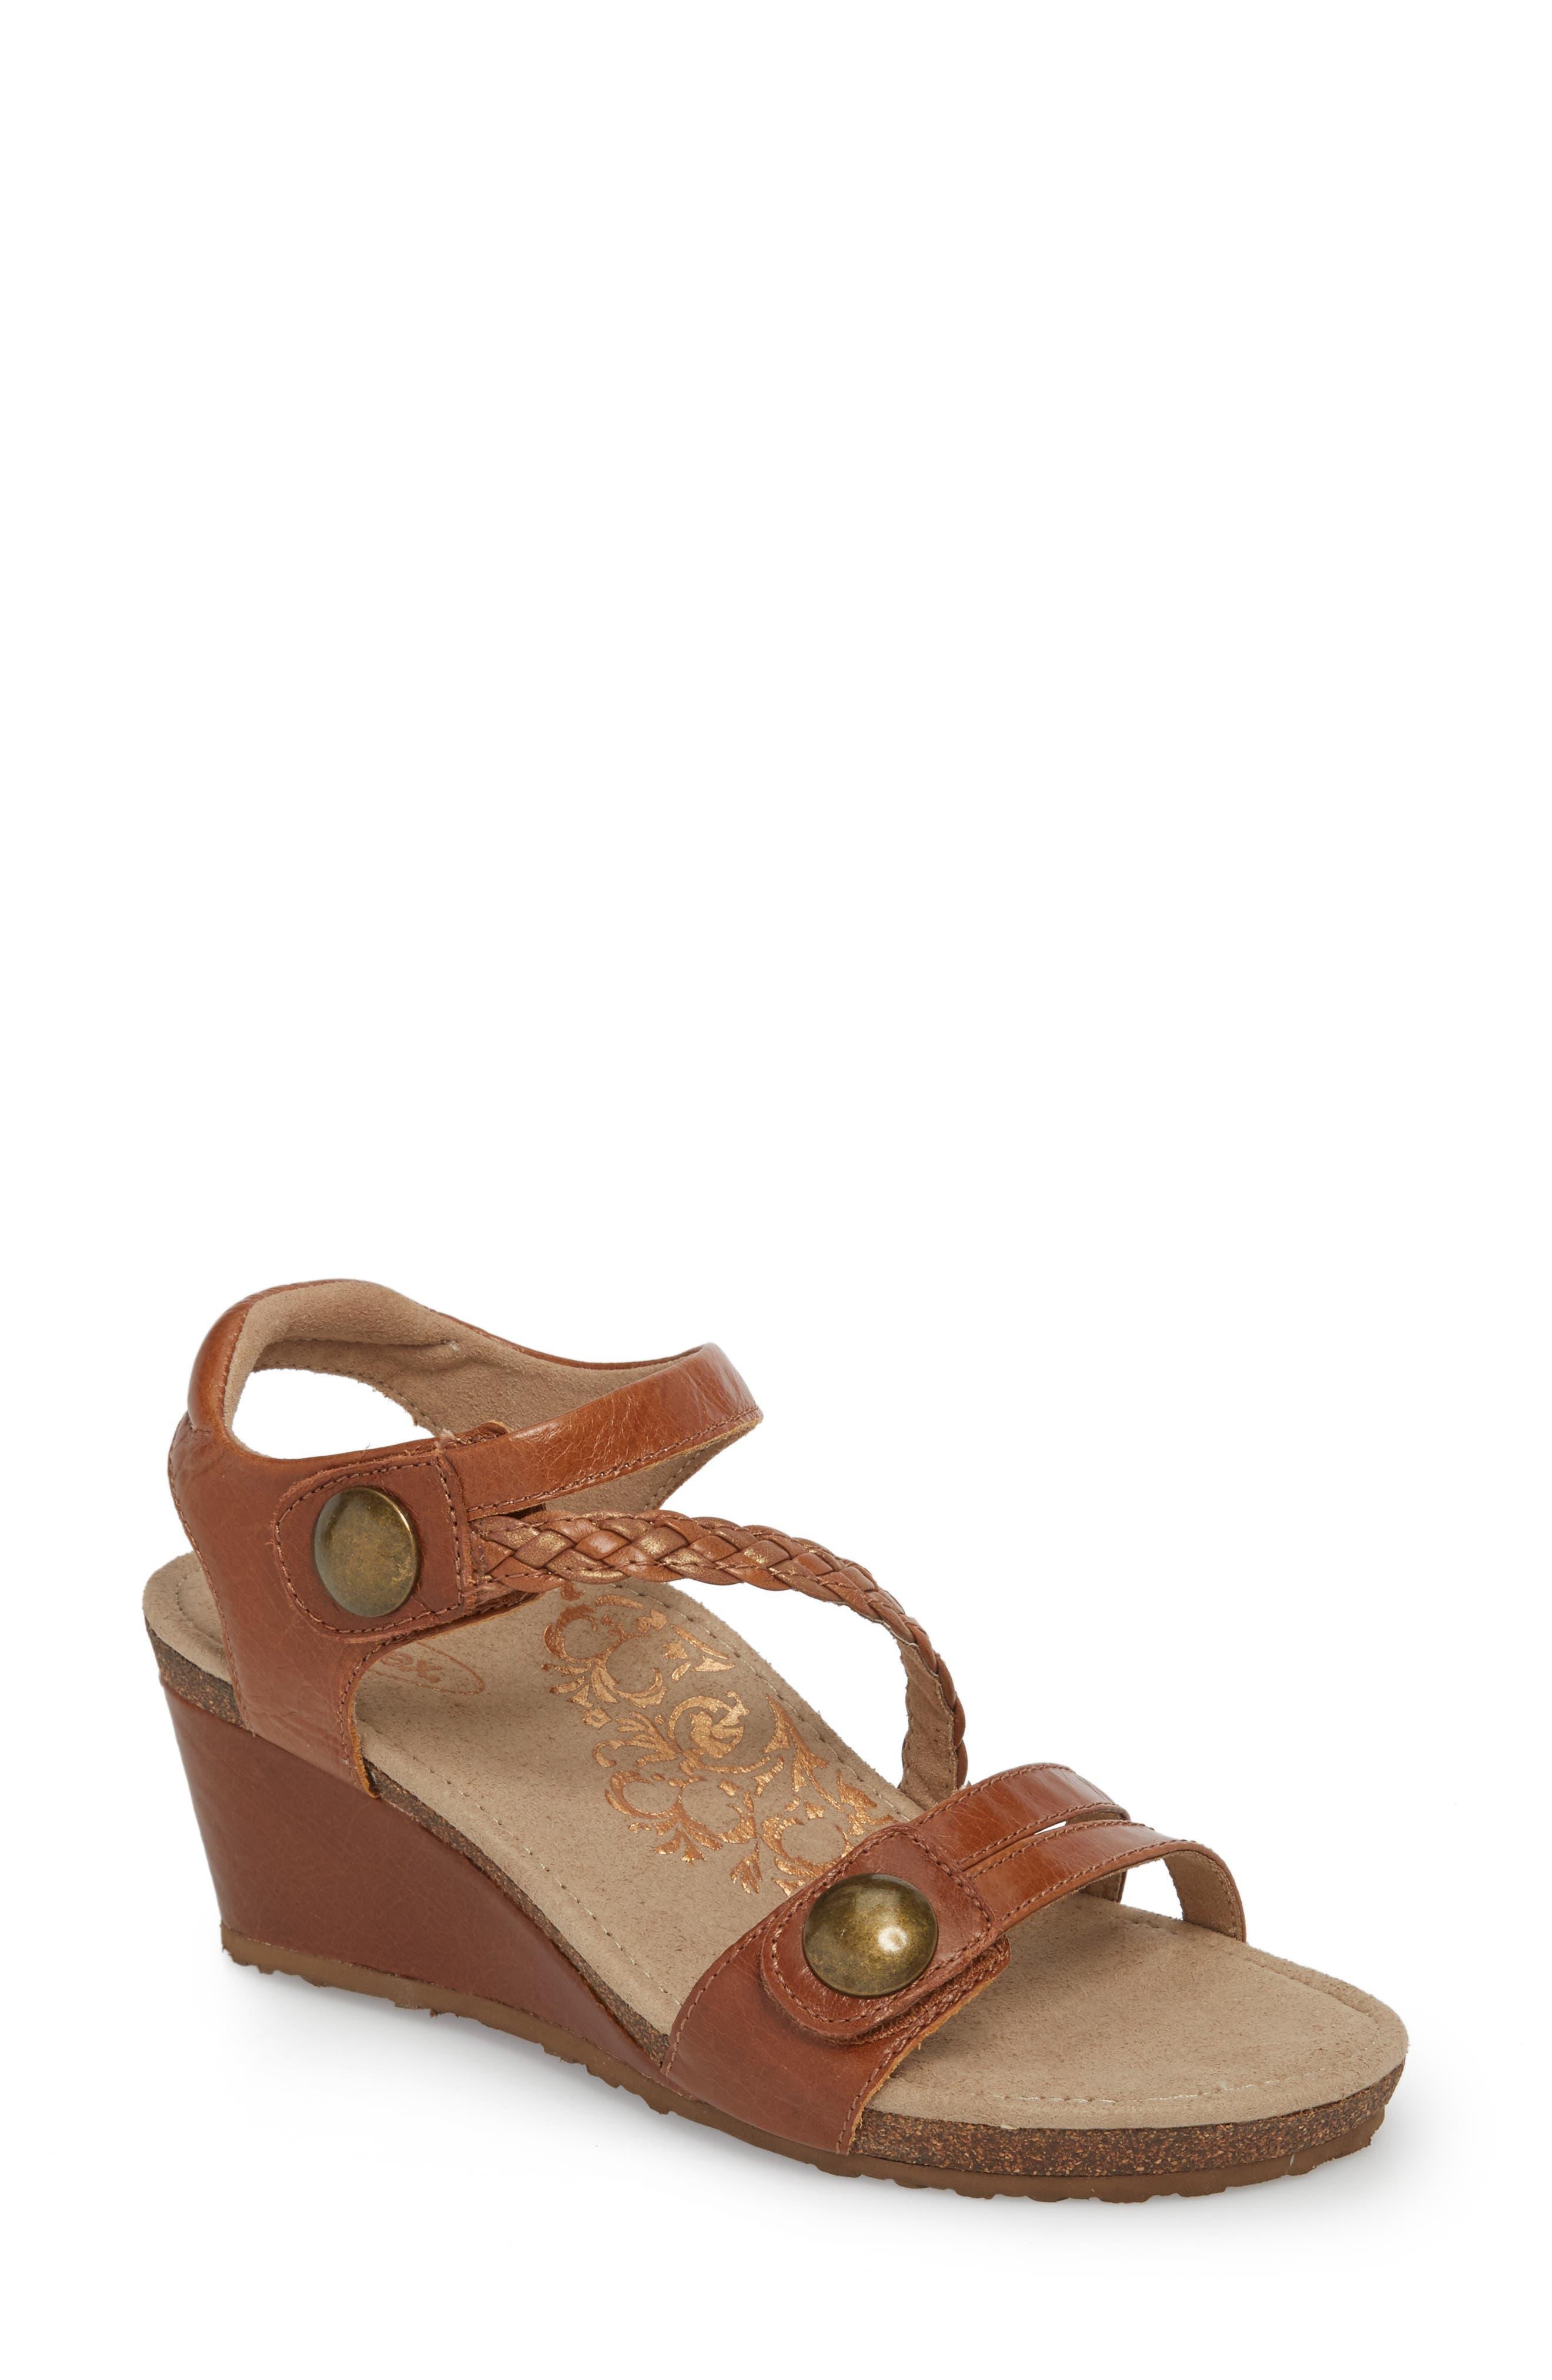 'Naya' Wedge Sandal,                             Main thumbnail 1, color,                             Cognac Leather